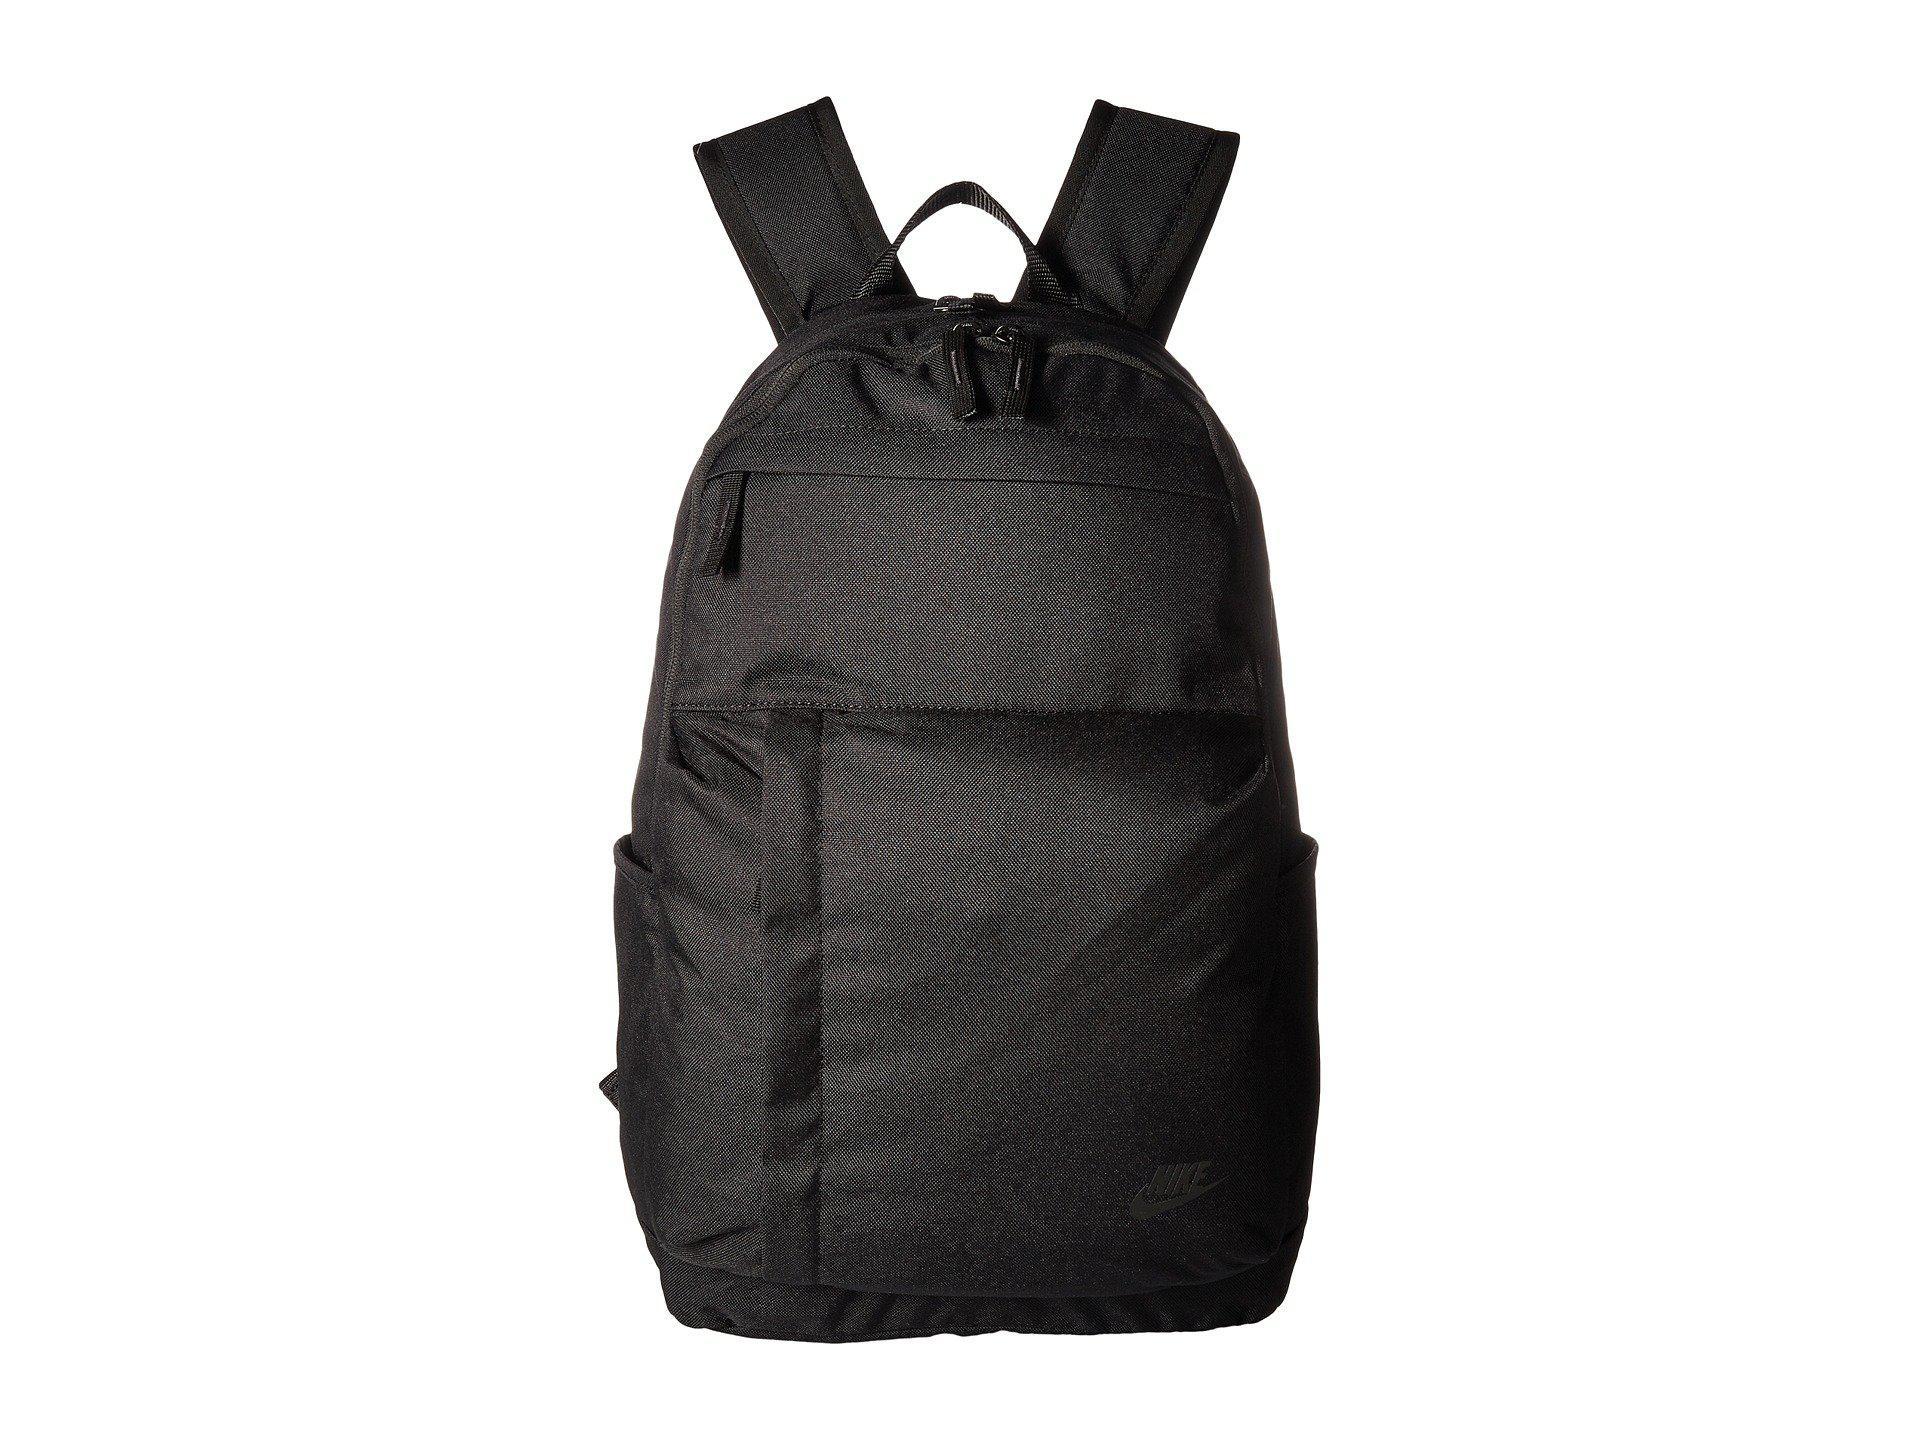 Lyst - Nike Elemental Backpack - Lbr in Black for Men 4a9abb83fbcda